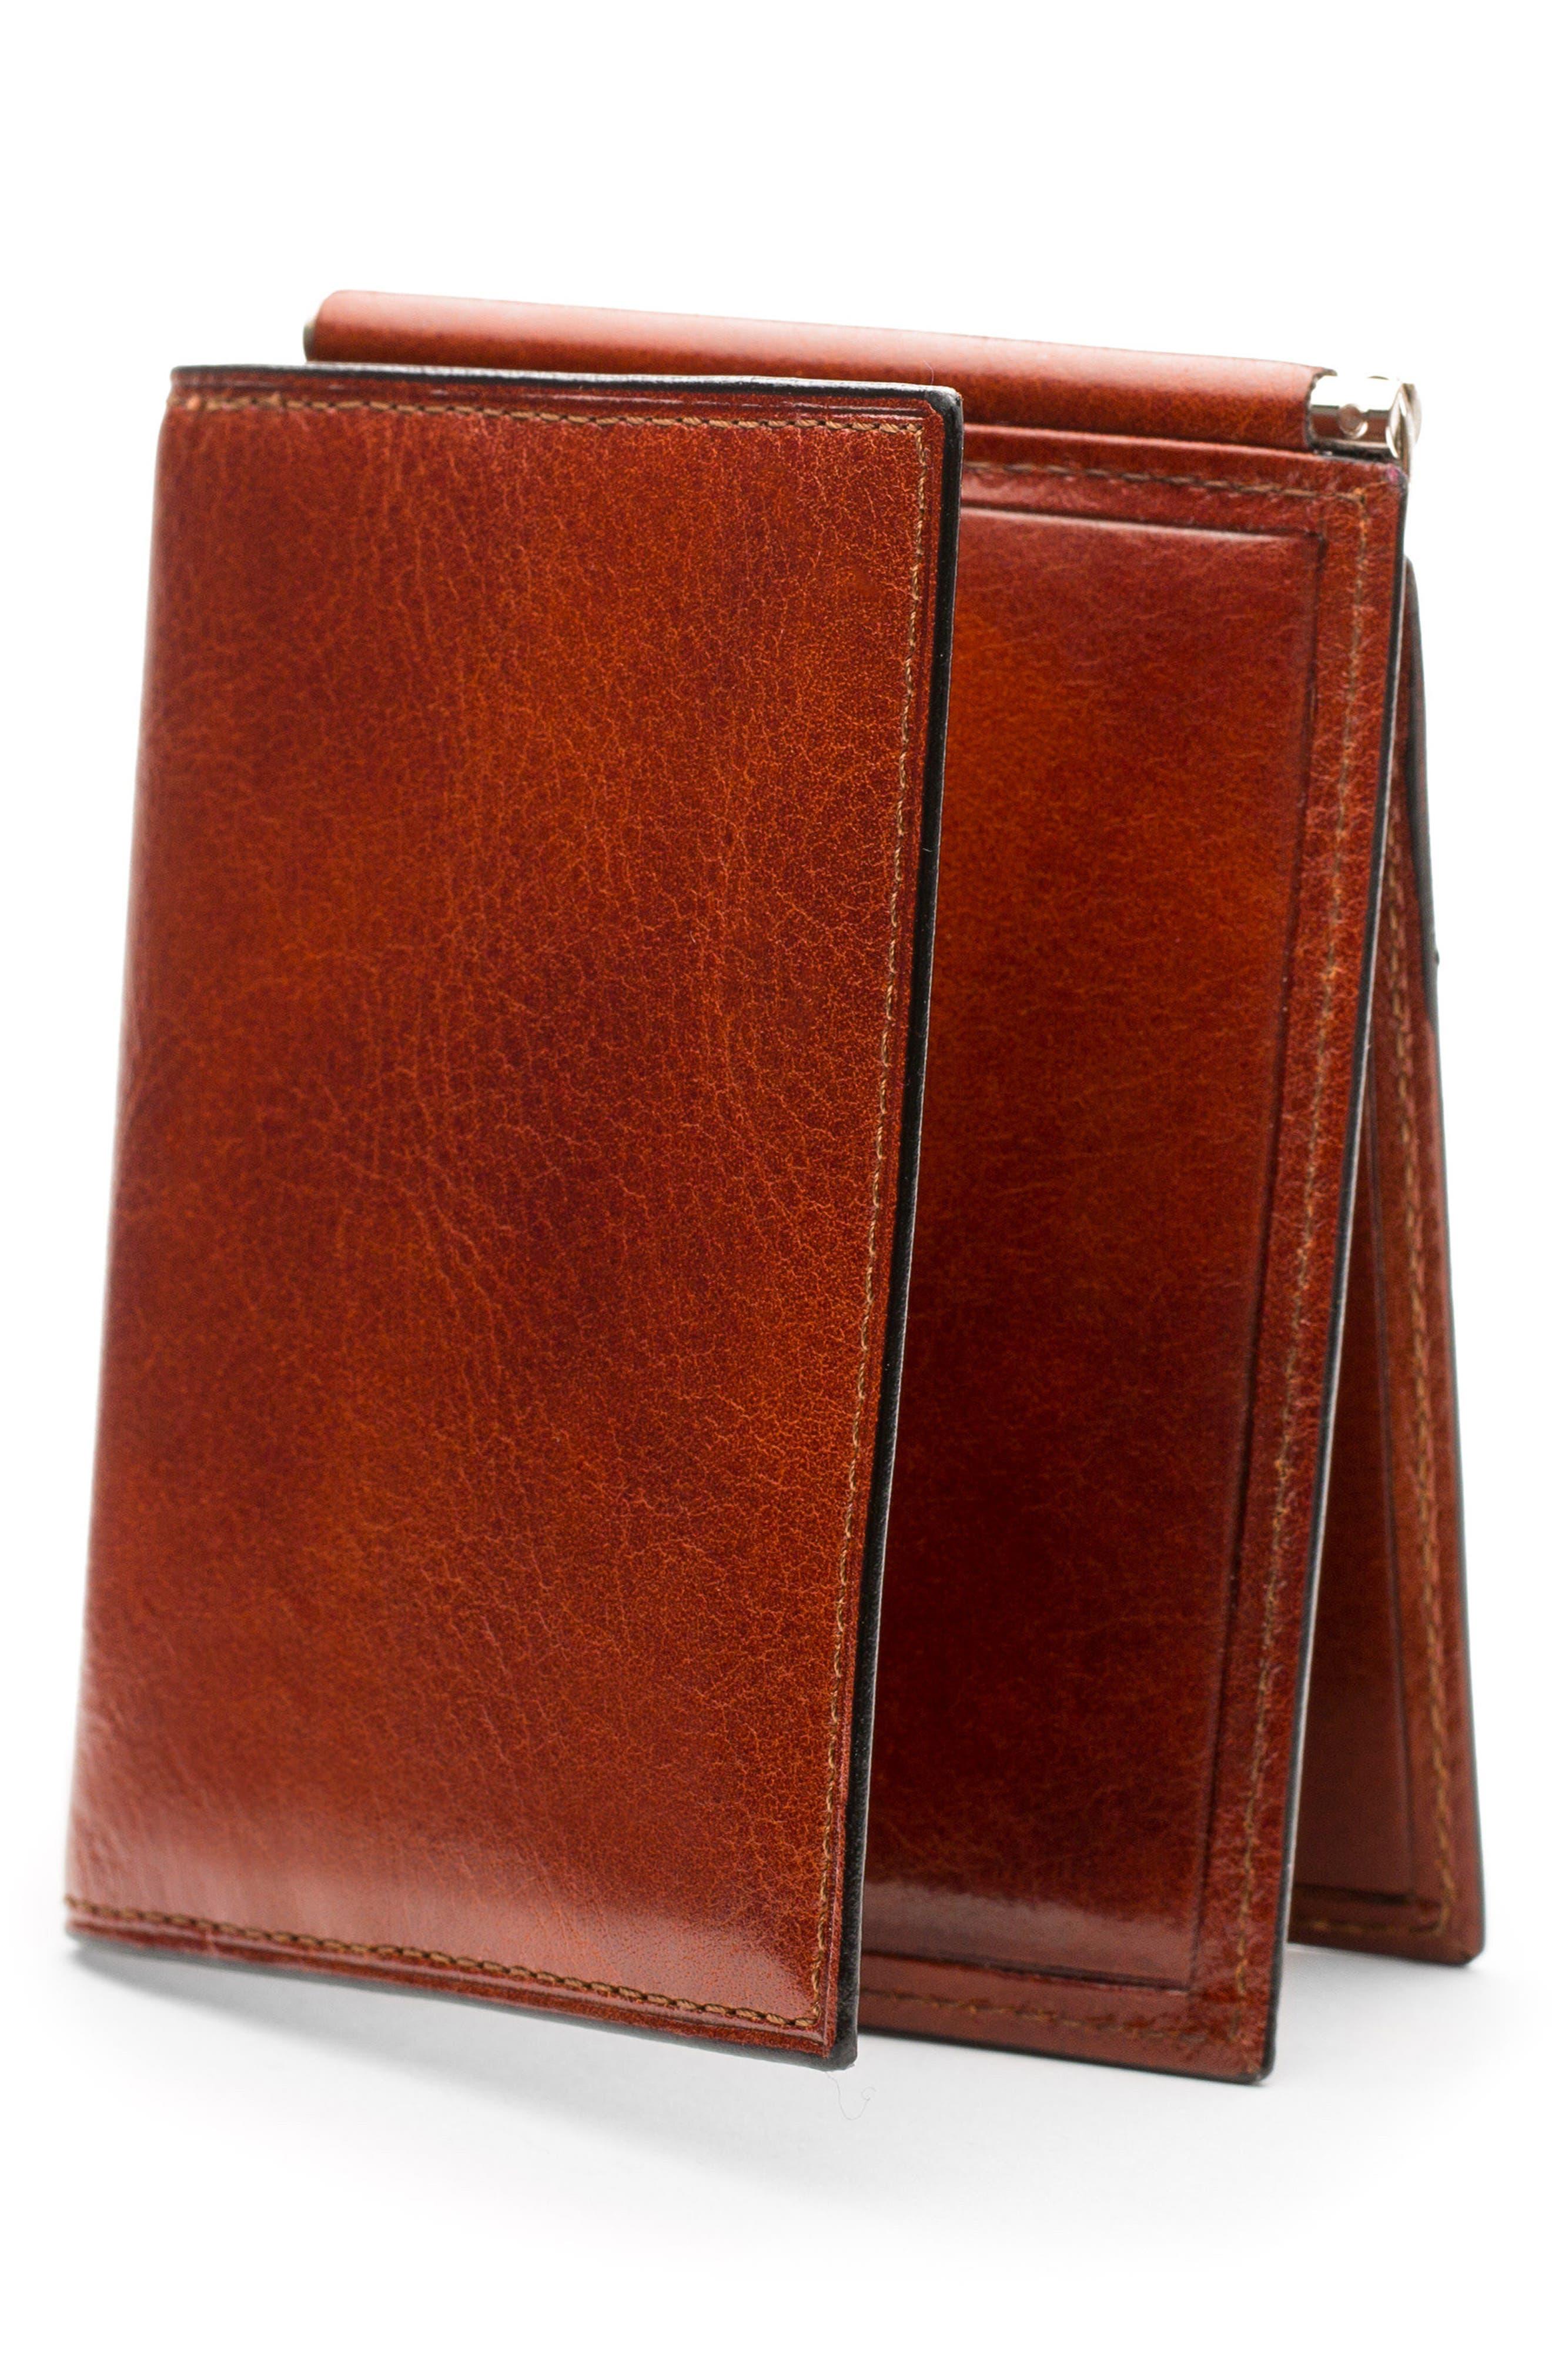 Bosca Leather Money Clip Wallet